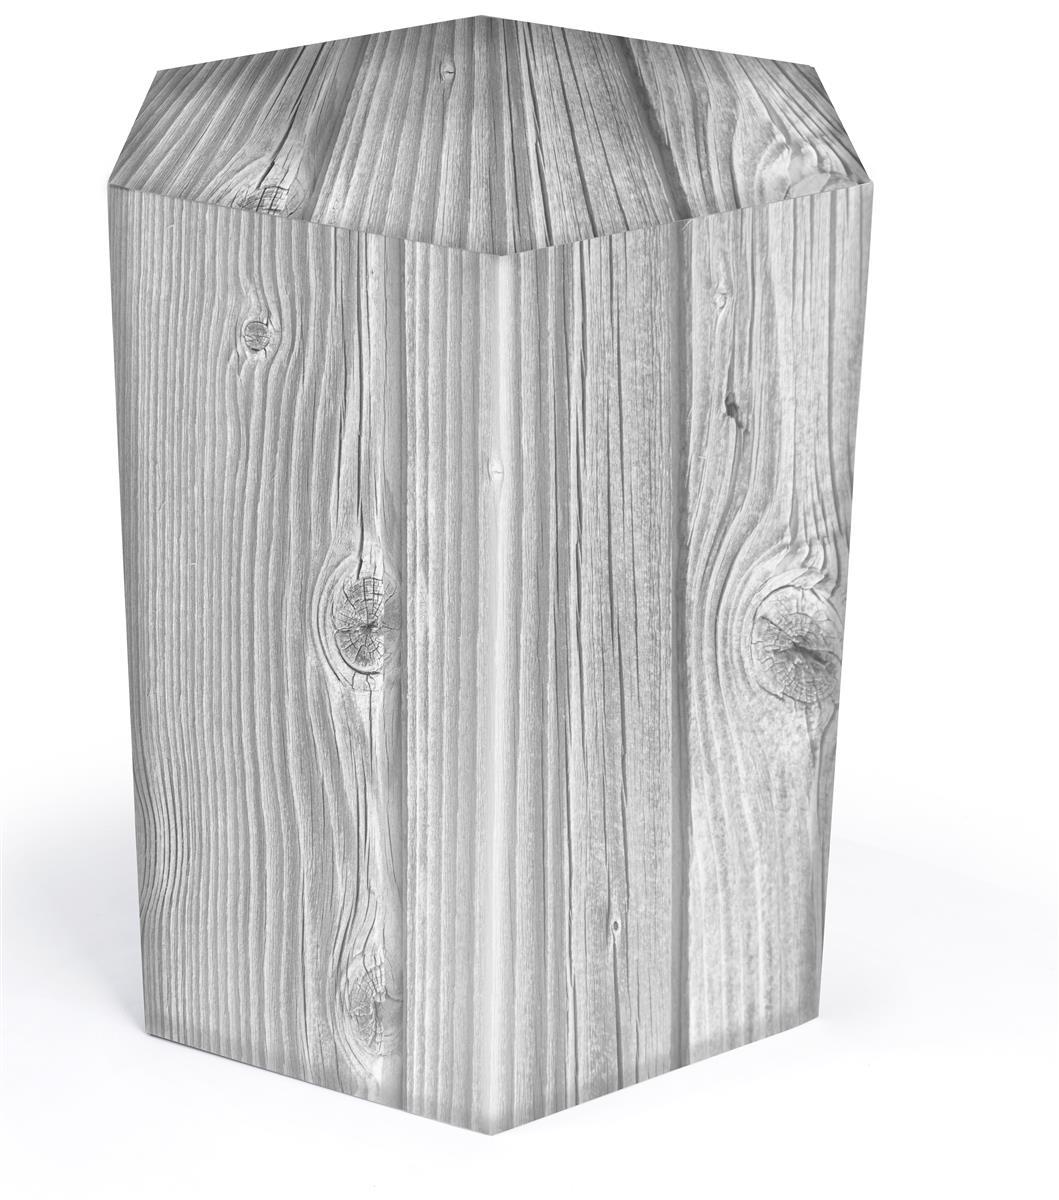 Cardboard Furniture Hex Table 29 H